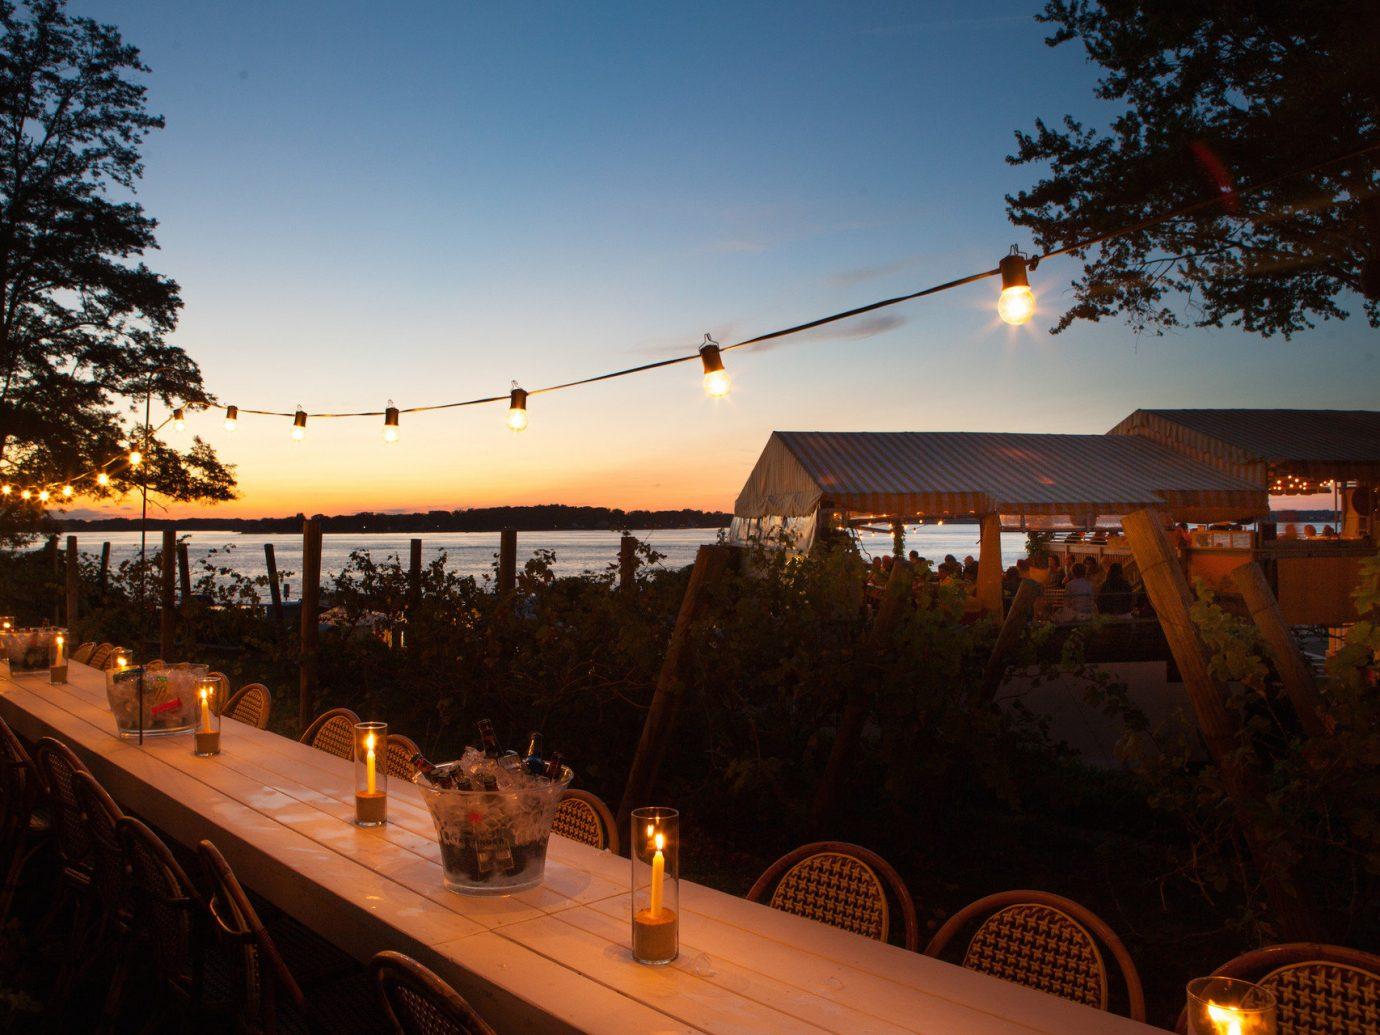 ambient lighting Beachfront dusk Ocean Romance Romantic string lights Sunset Trip Ideas Weekend Getaways tree outdoor sky night light evening lighting Resort day